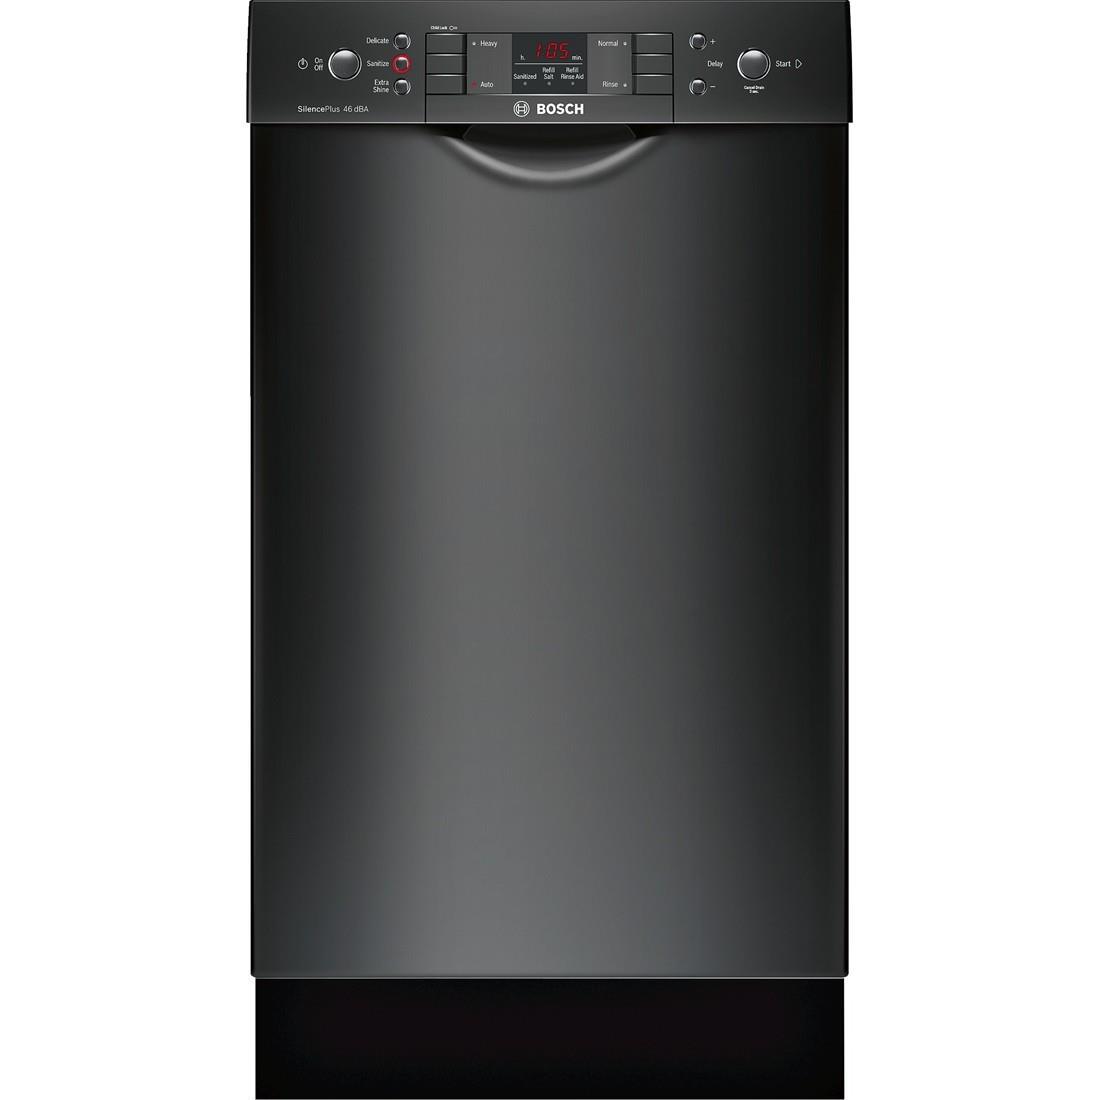 "Bosch Dishwashers 18"" Built-In Dishwasher - Item Number: SPE53U56UC"